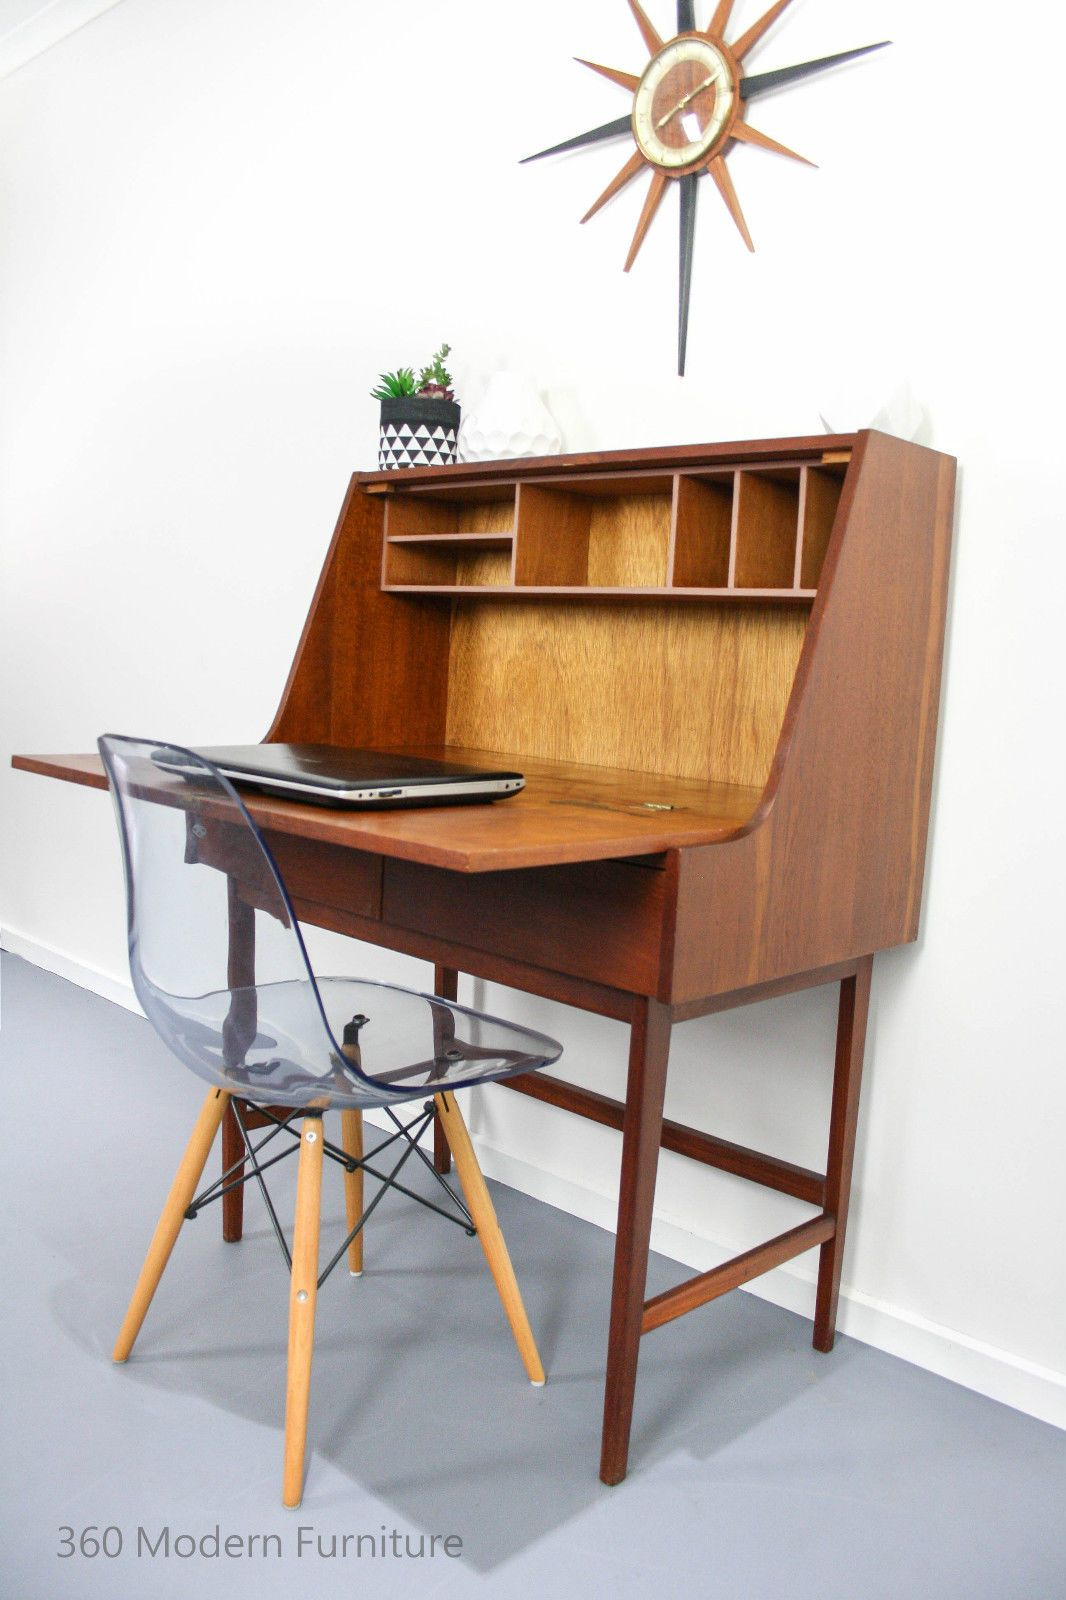 Mid Century Modern Desk Cabinet Vintage Retro Sideboard Teak Danish Hall Stand Retro Sideboard Retro Vintage Sideboard Mid Century Modern Desk